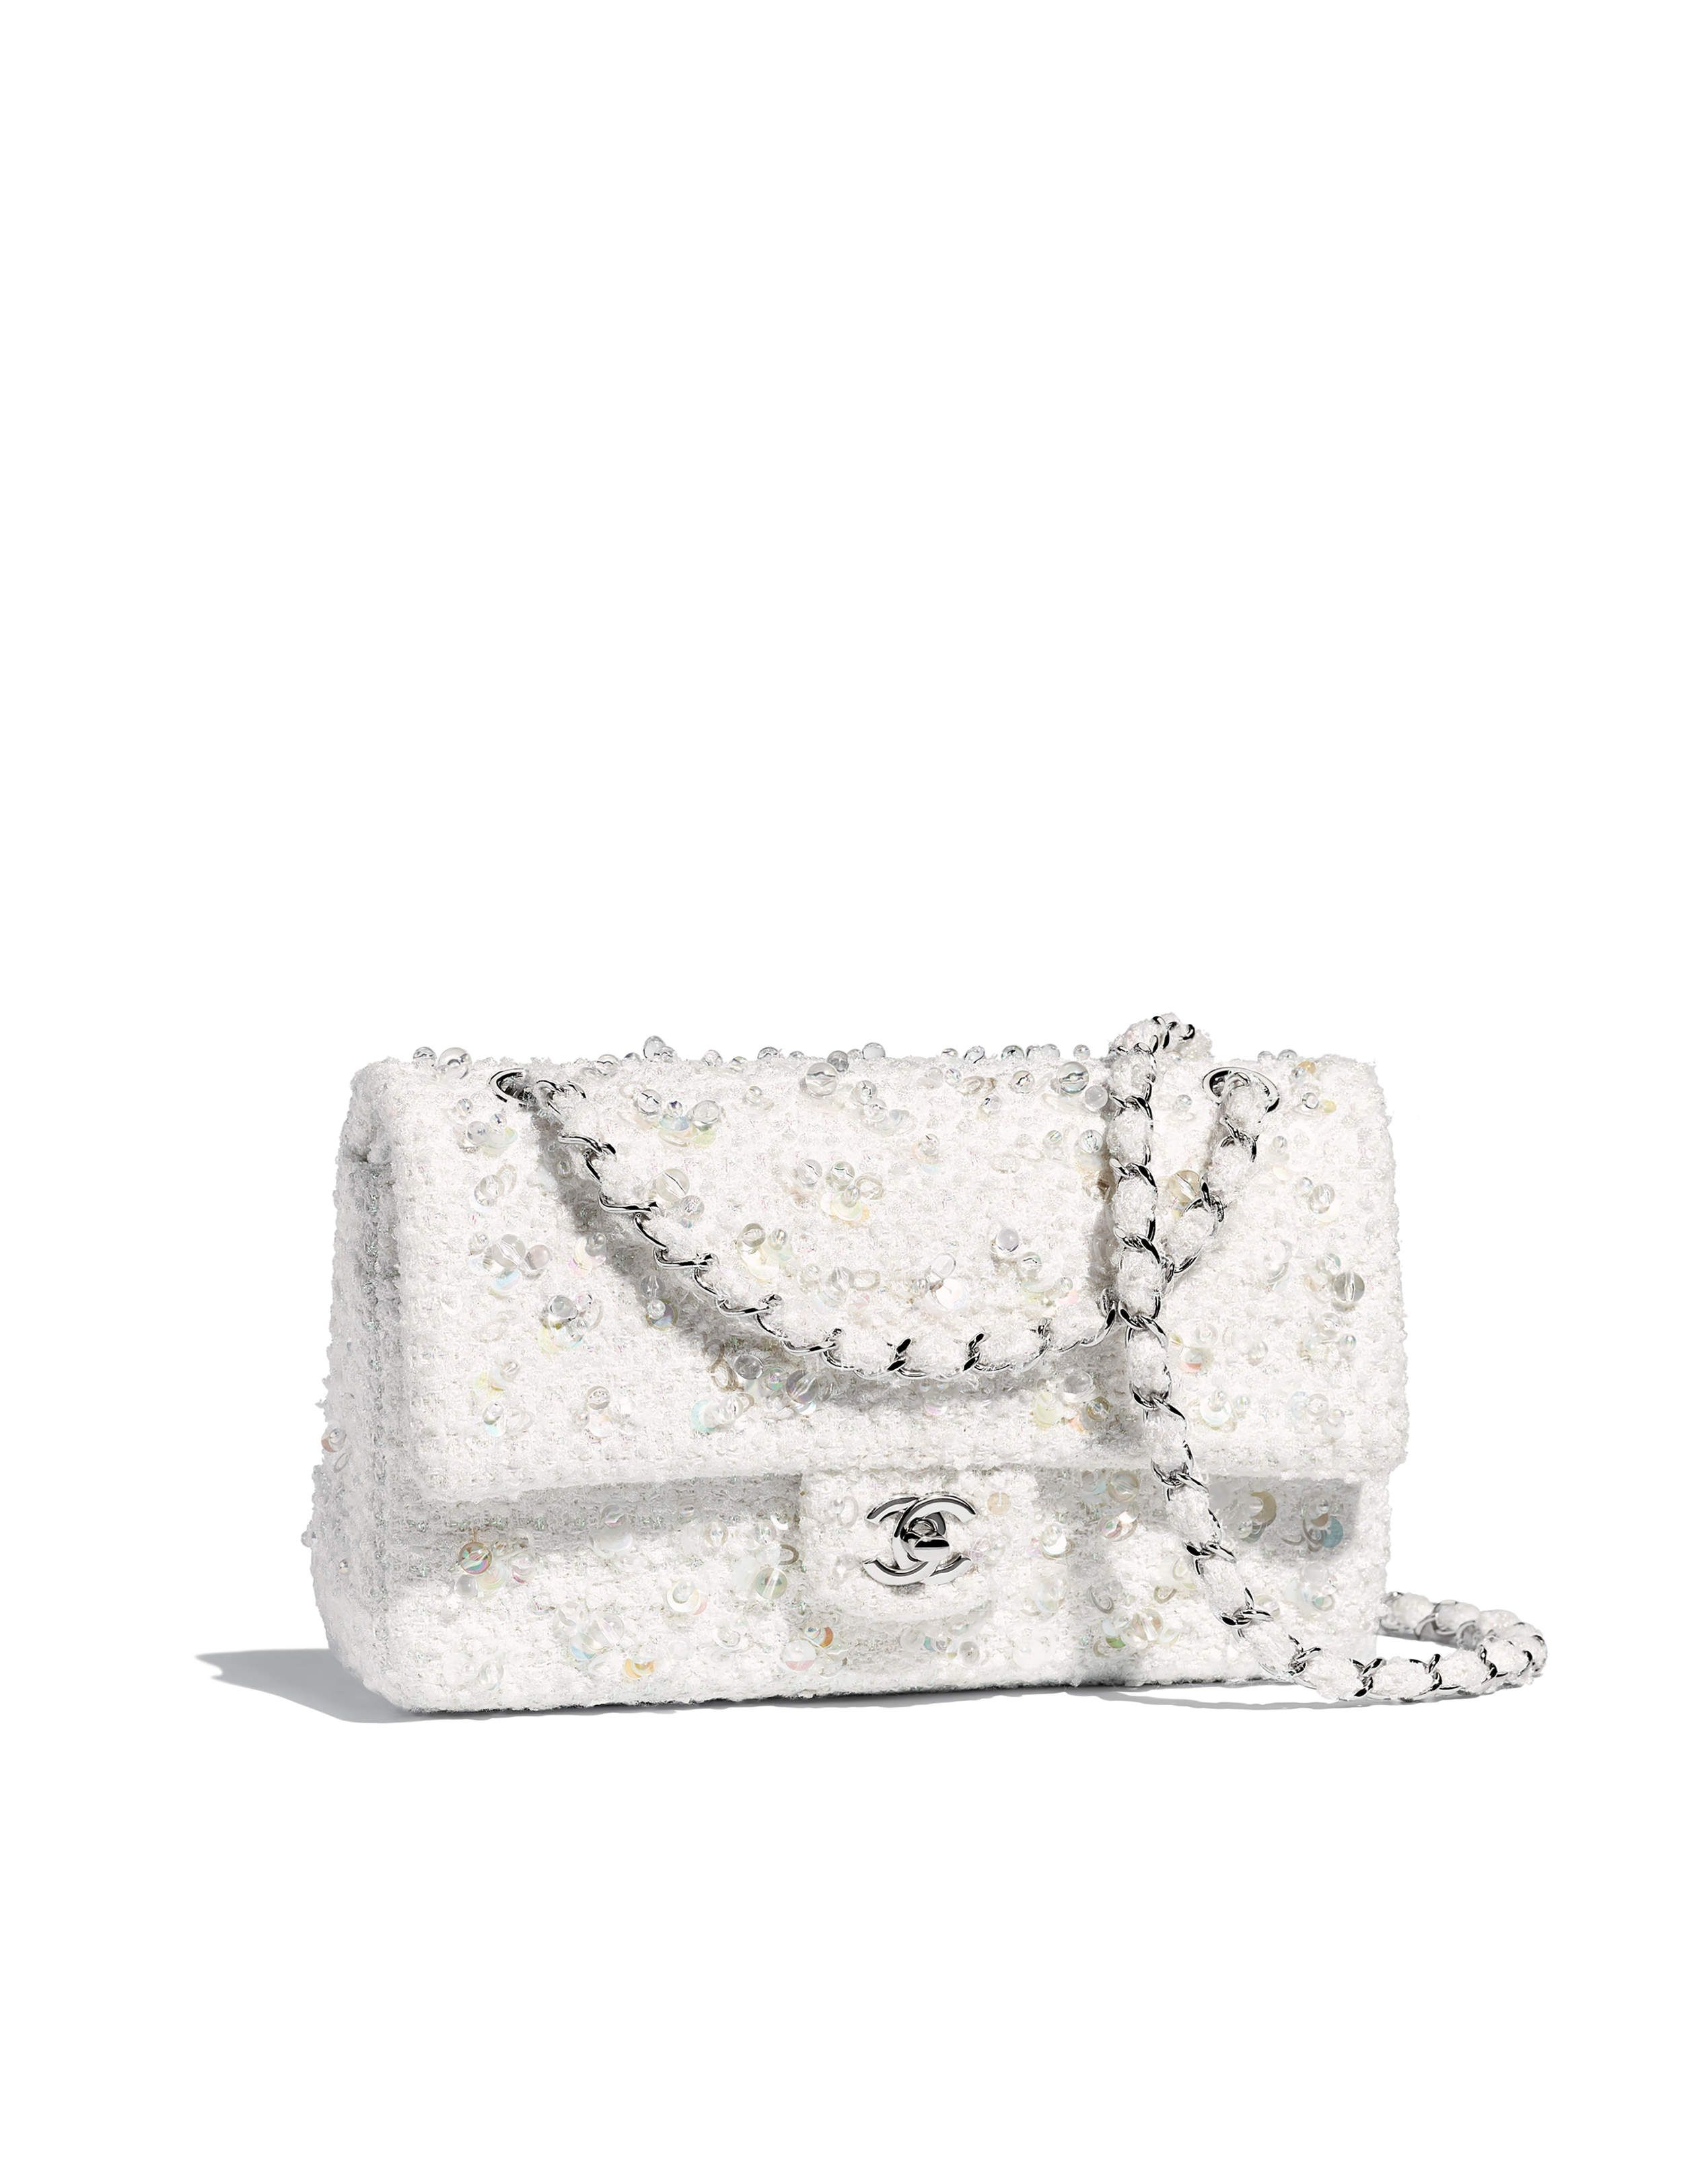 b0cb103c11d6d Bolsa clássica, tweed bordado   metal prateado-branco - CHANEL   Chanel